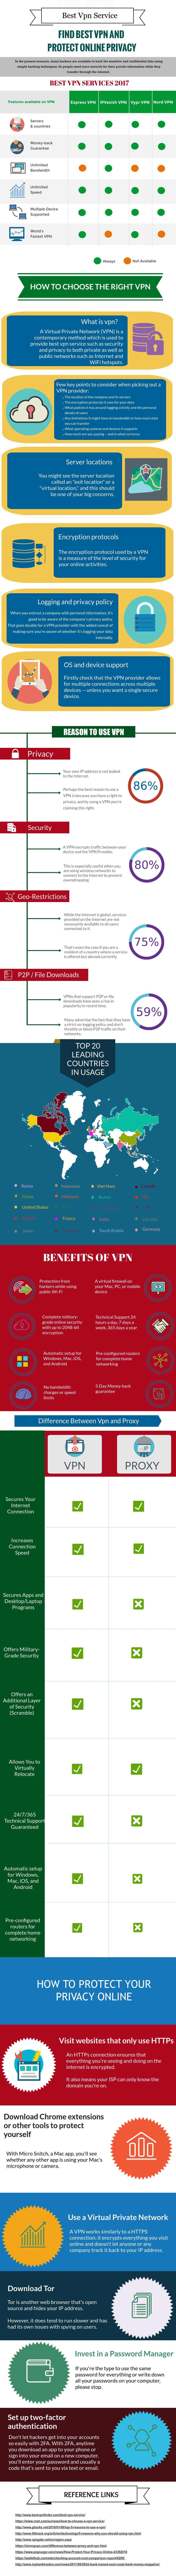 best-vpn-service-infographic